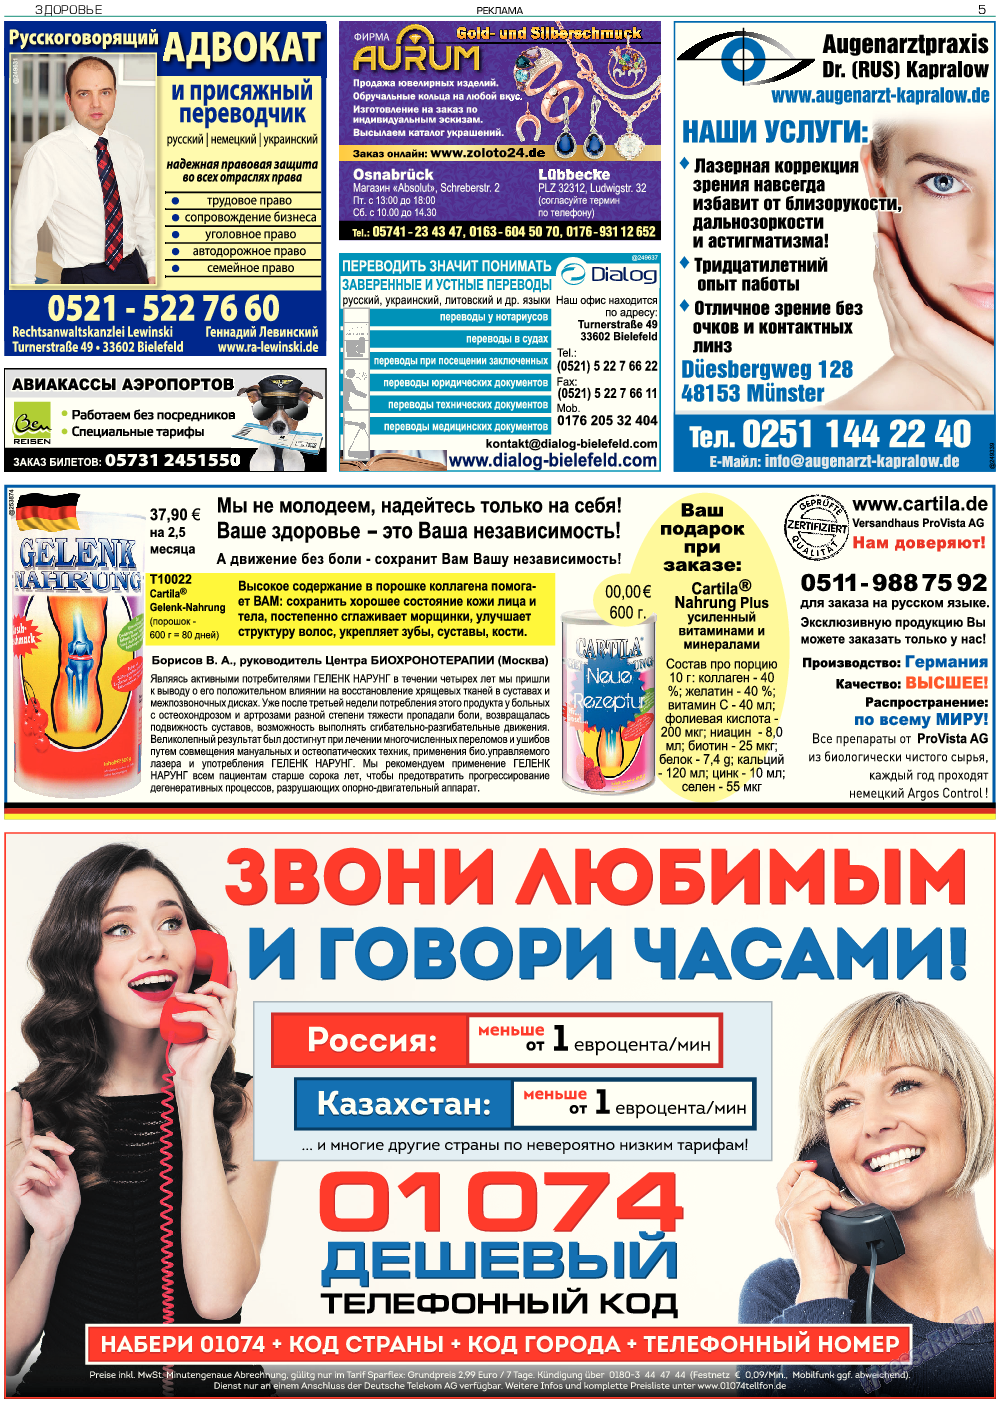 Здоровье (газета). 2017 год, номер 7, стр. 5